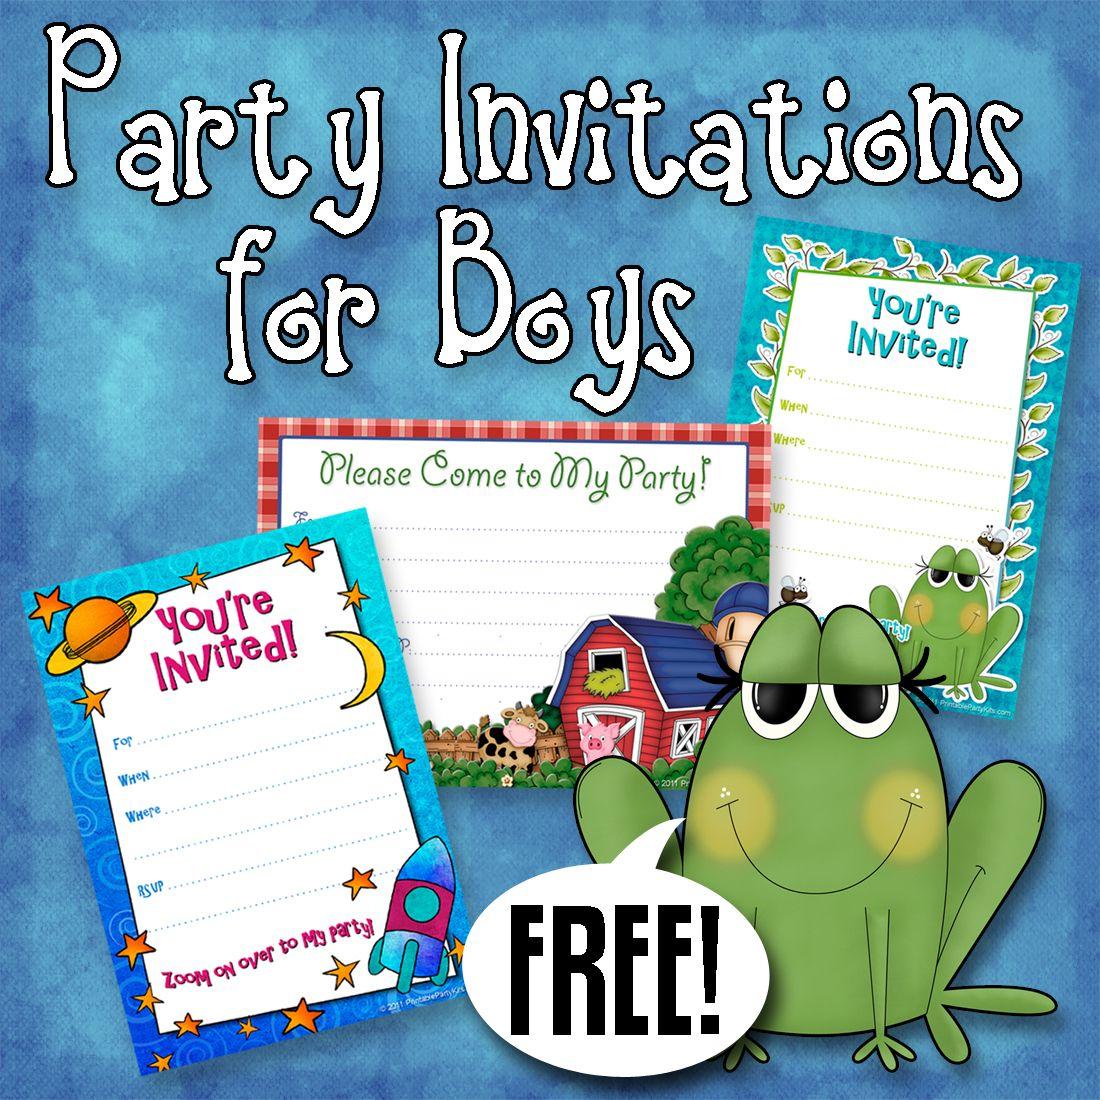 Free Printable Boys Birthday Party Invitations | Party Printables - Free Printable Boy Birthday Invitations